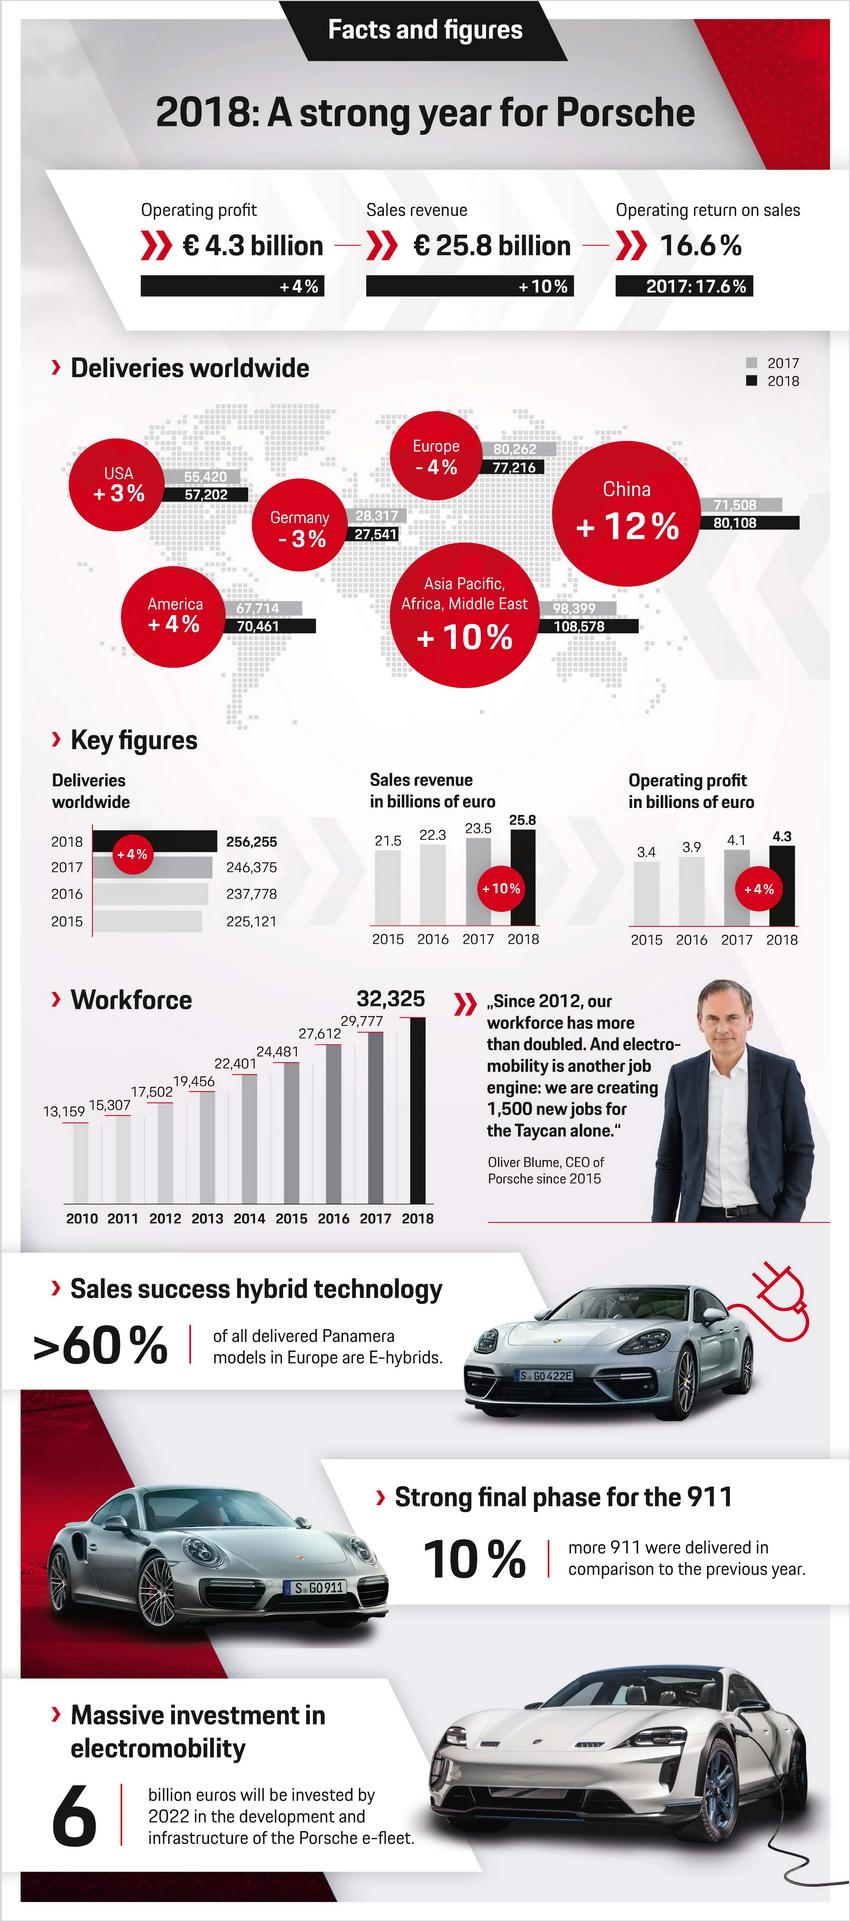 Kết quả kinh doanh năm 2018 của Porsche 4